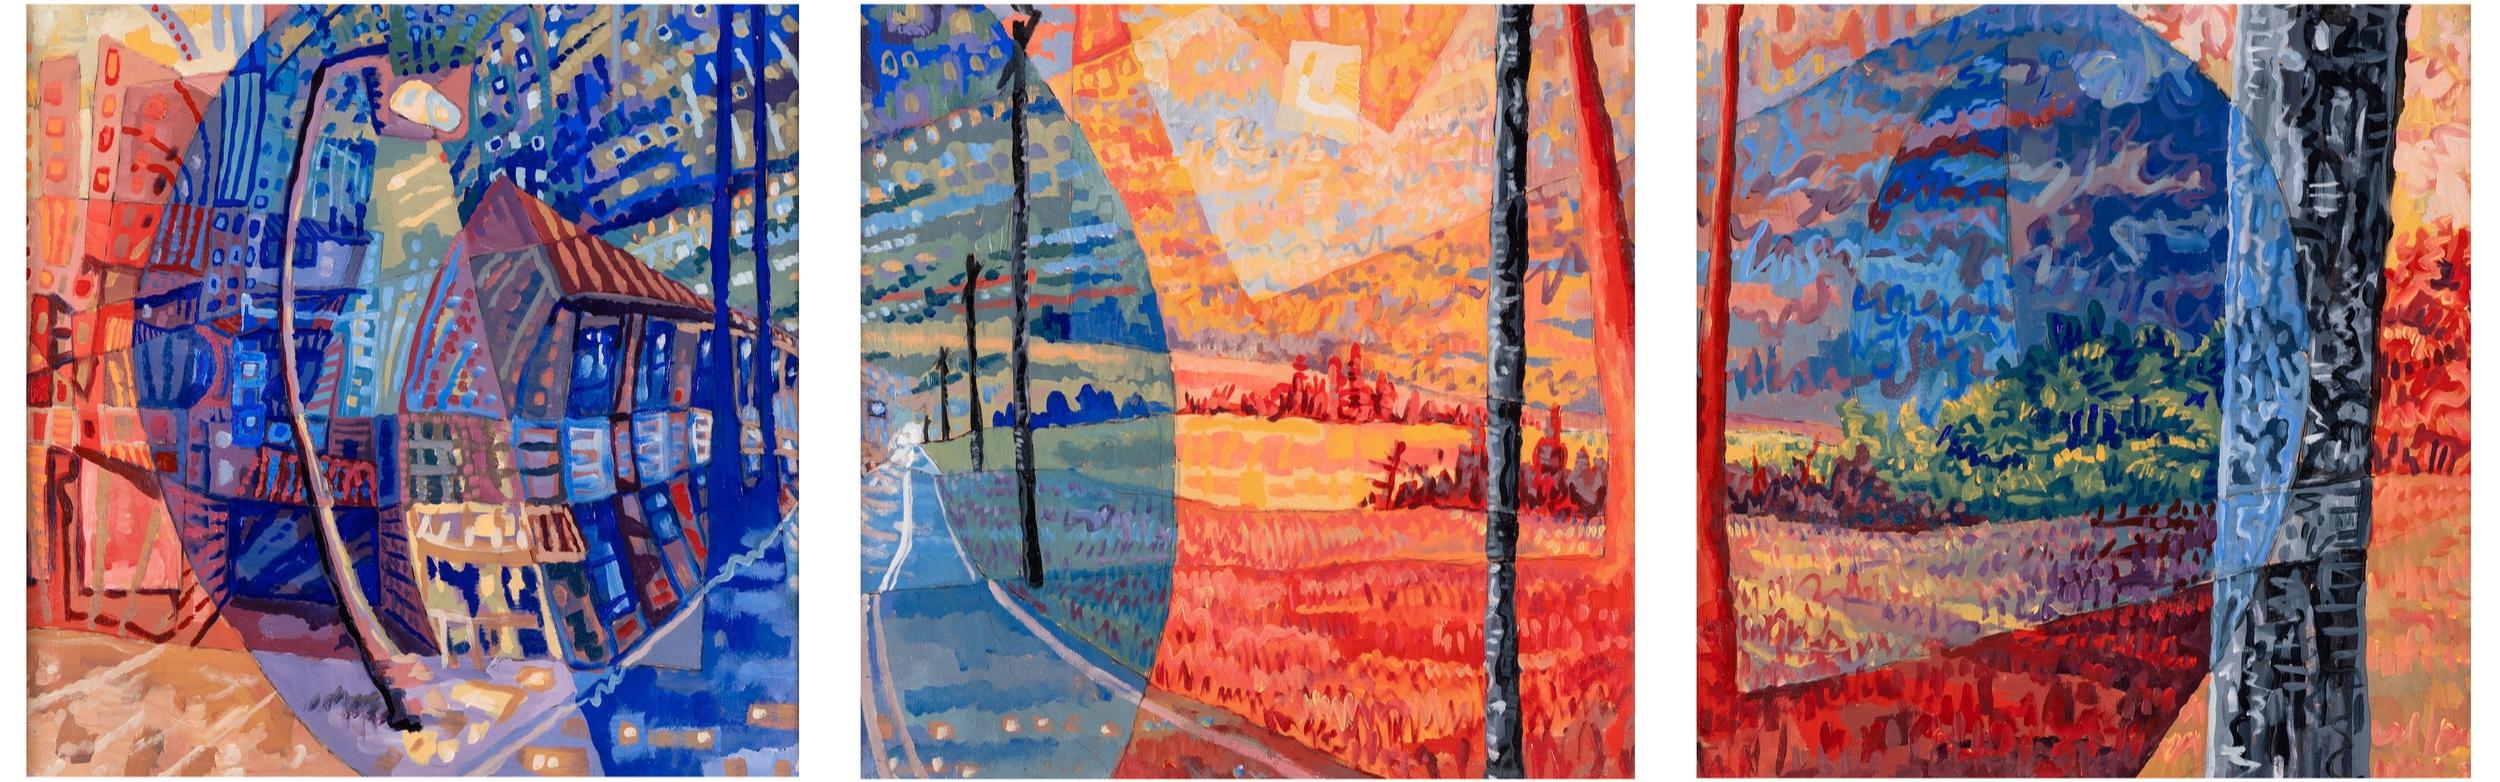 Charlie Hudson, Push and Pull, Acrylic on Panel, 24 x 24 each, 5,000.jpg